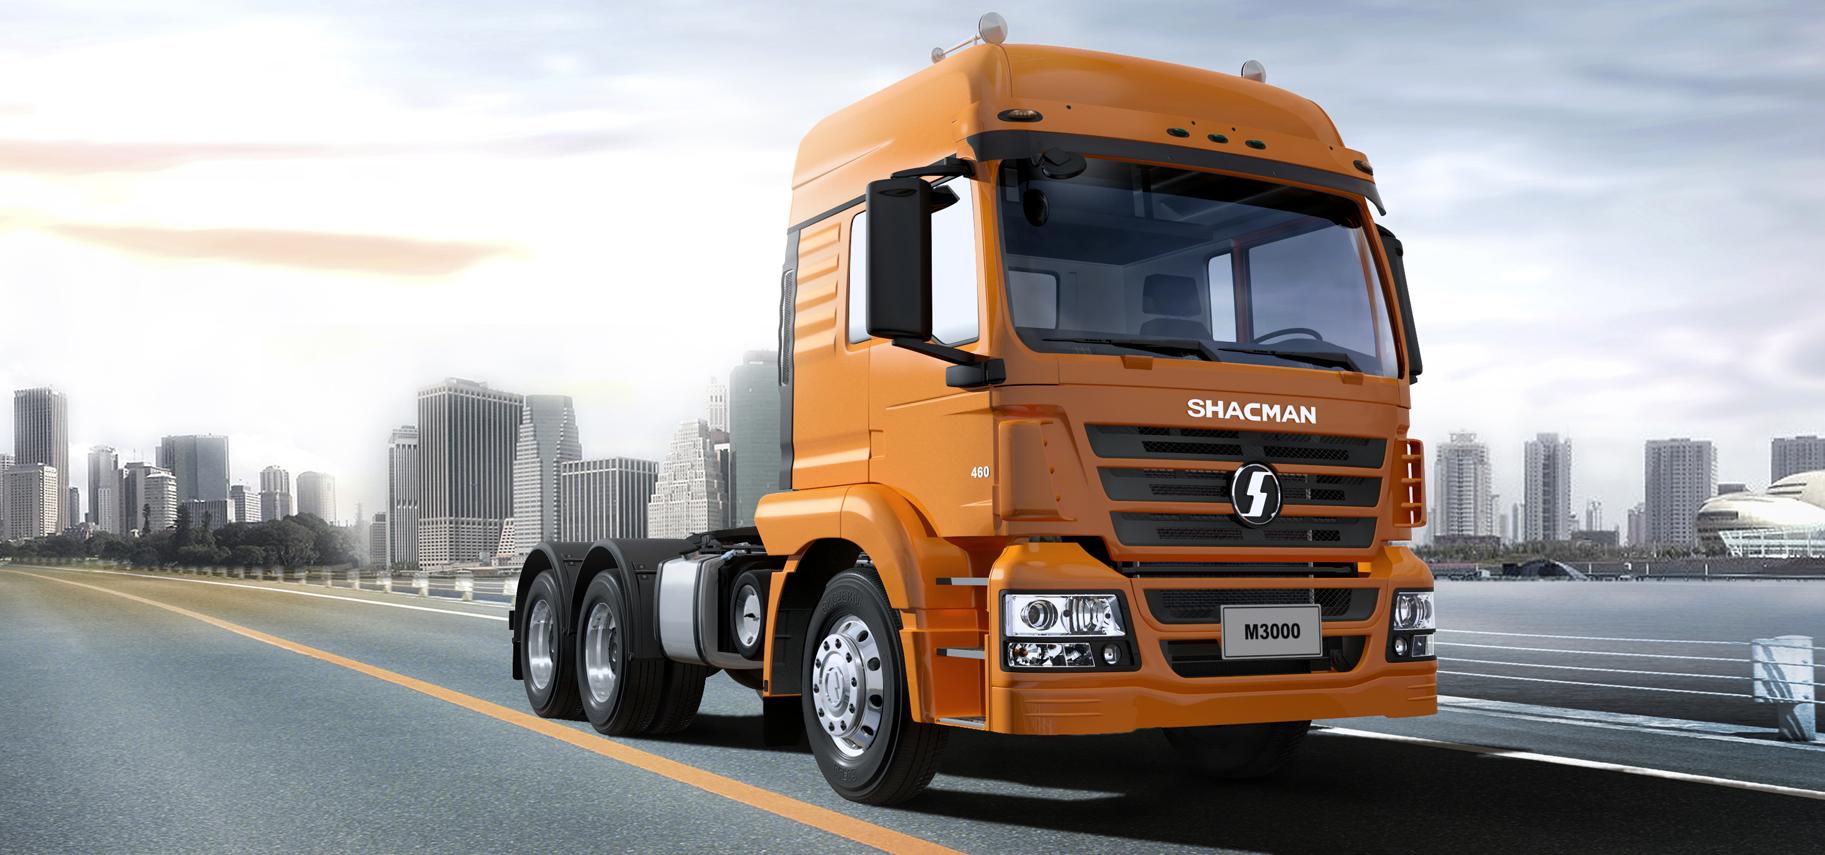 Shacman truck M3000